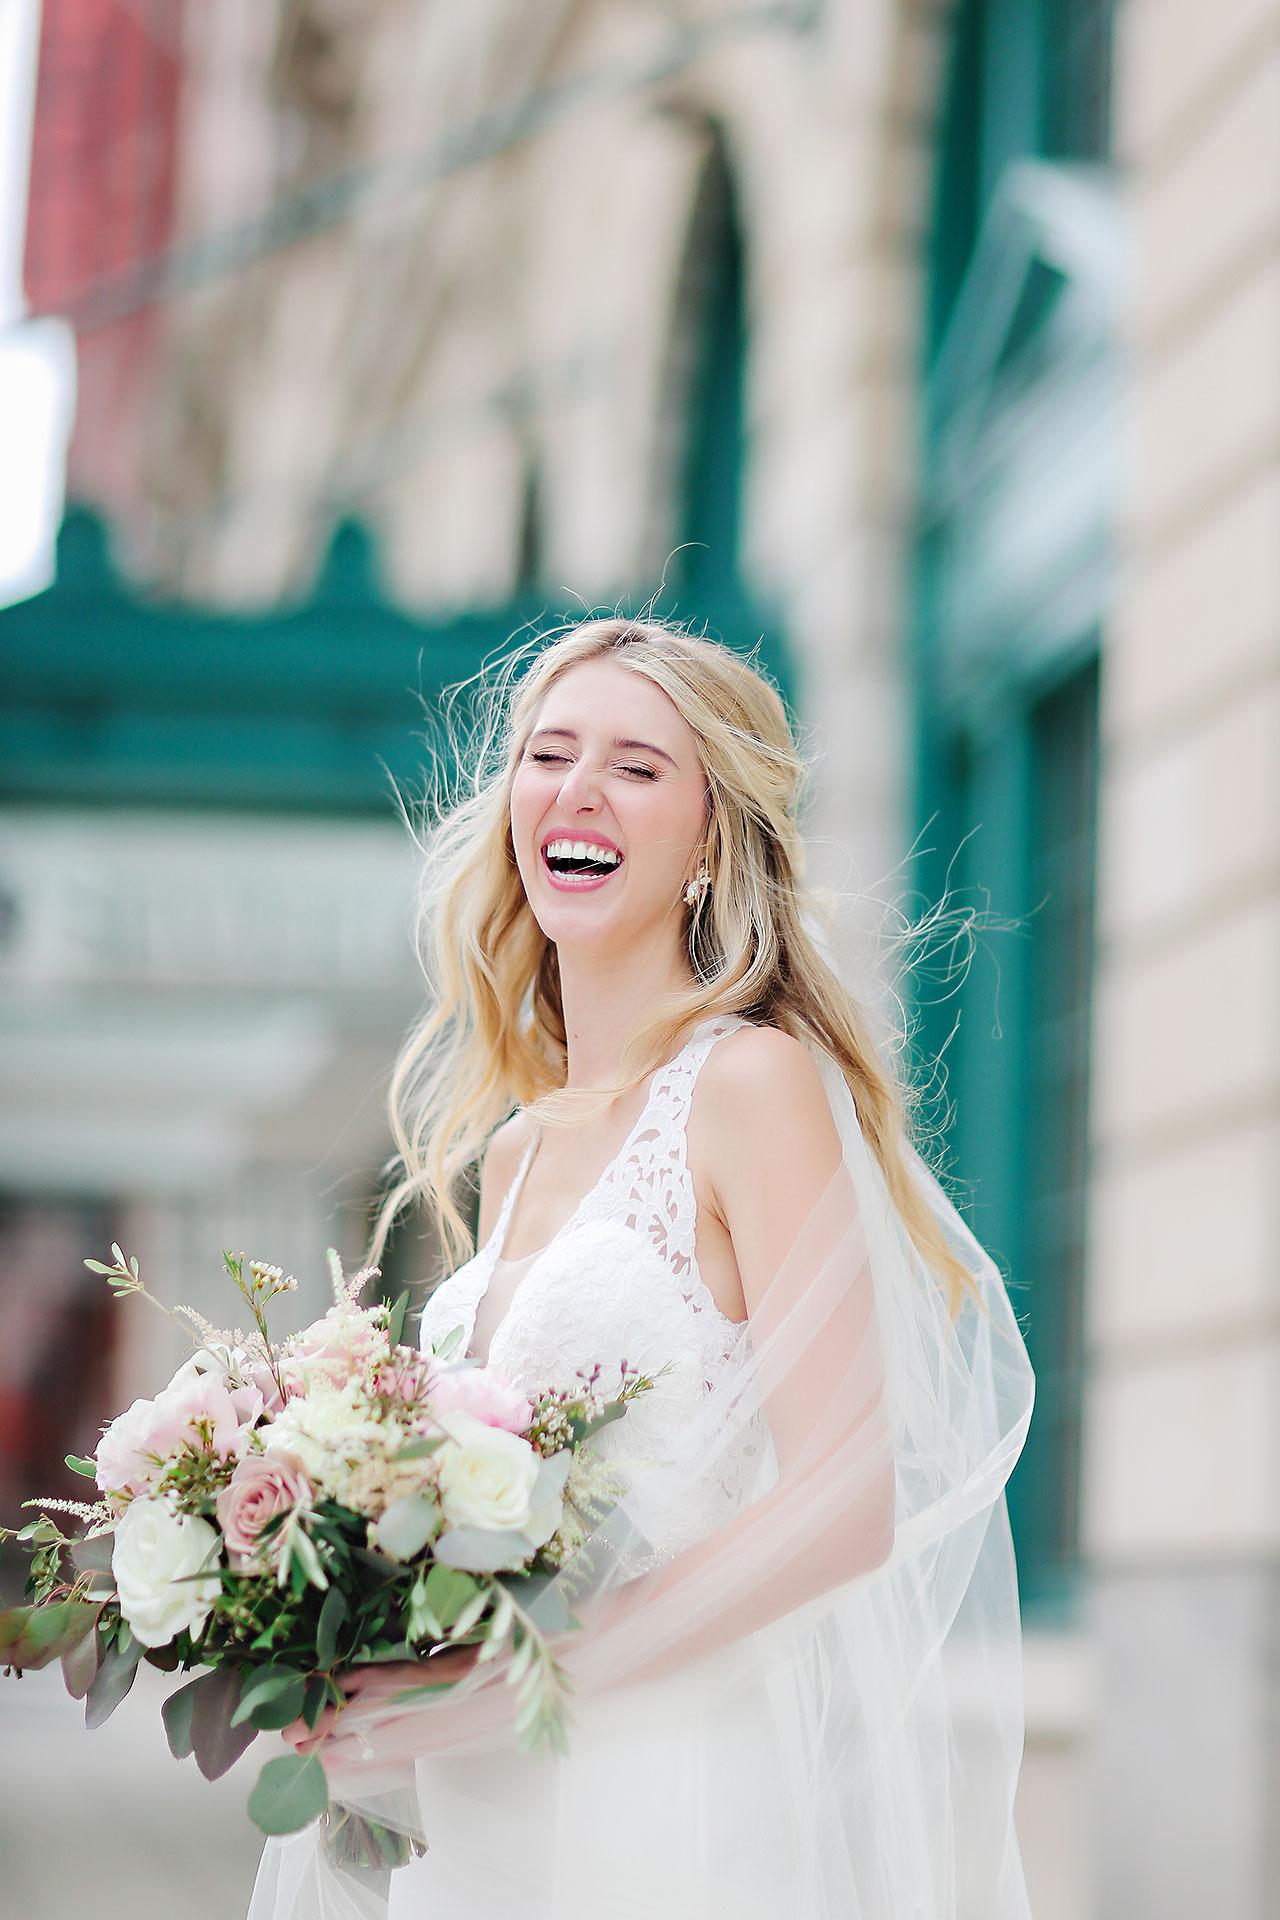 Allison Jeff Union Station Crowne Plaza Indianapolis wedding 075